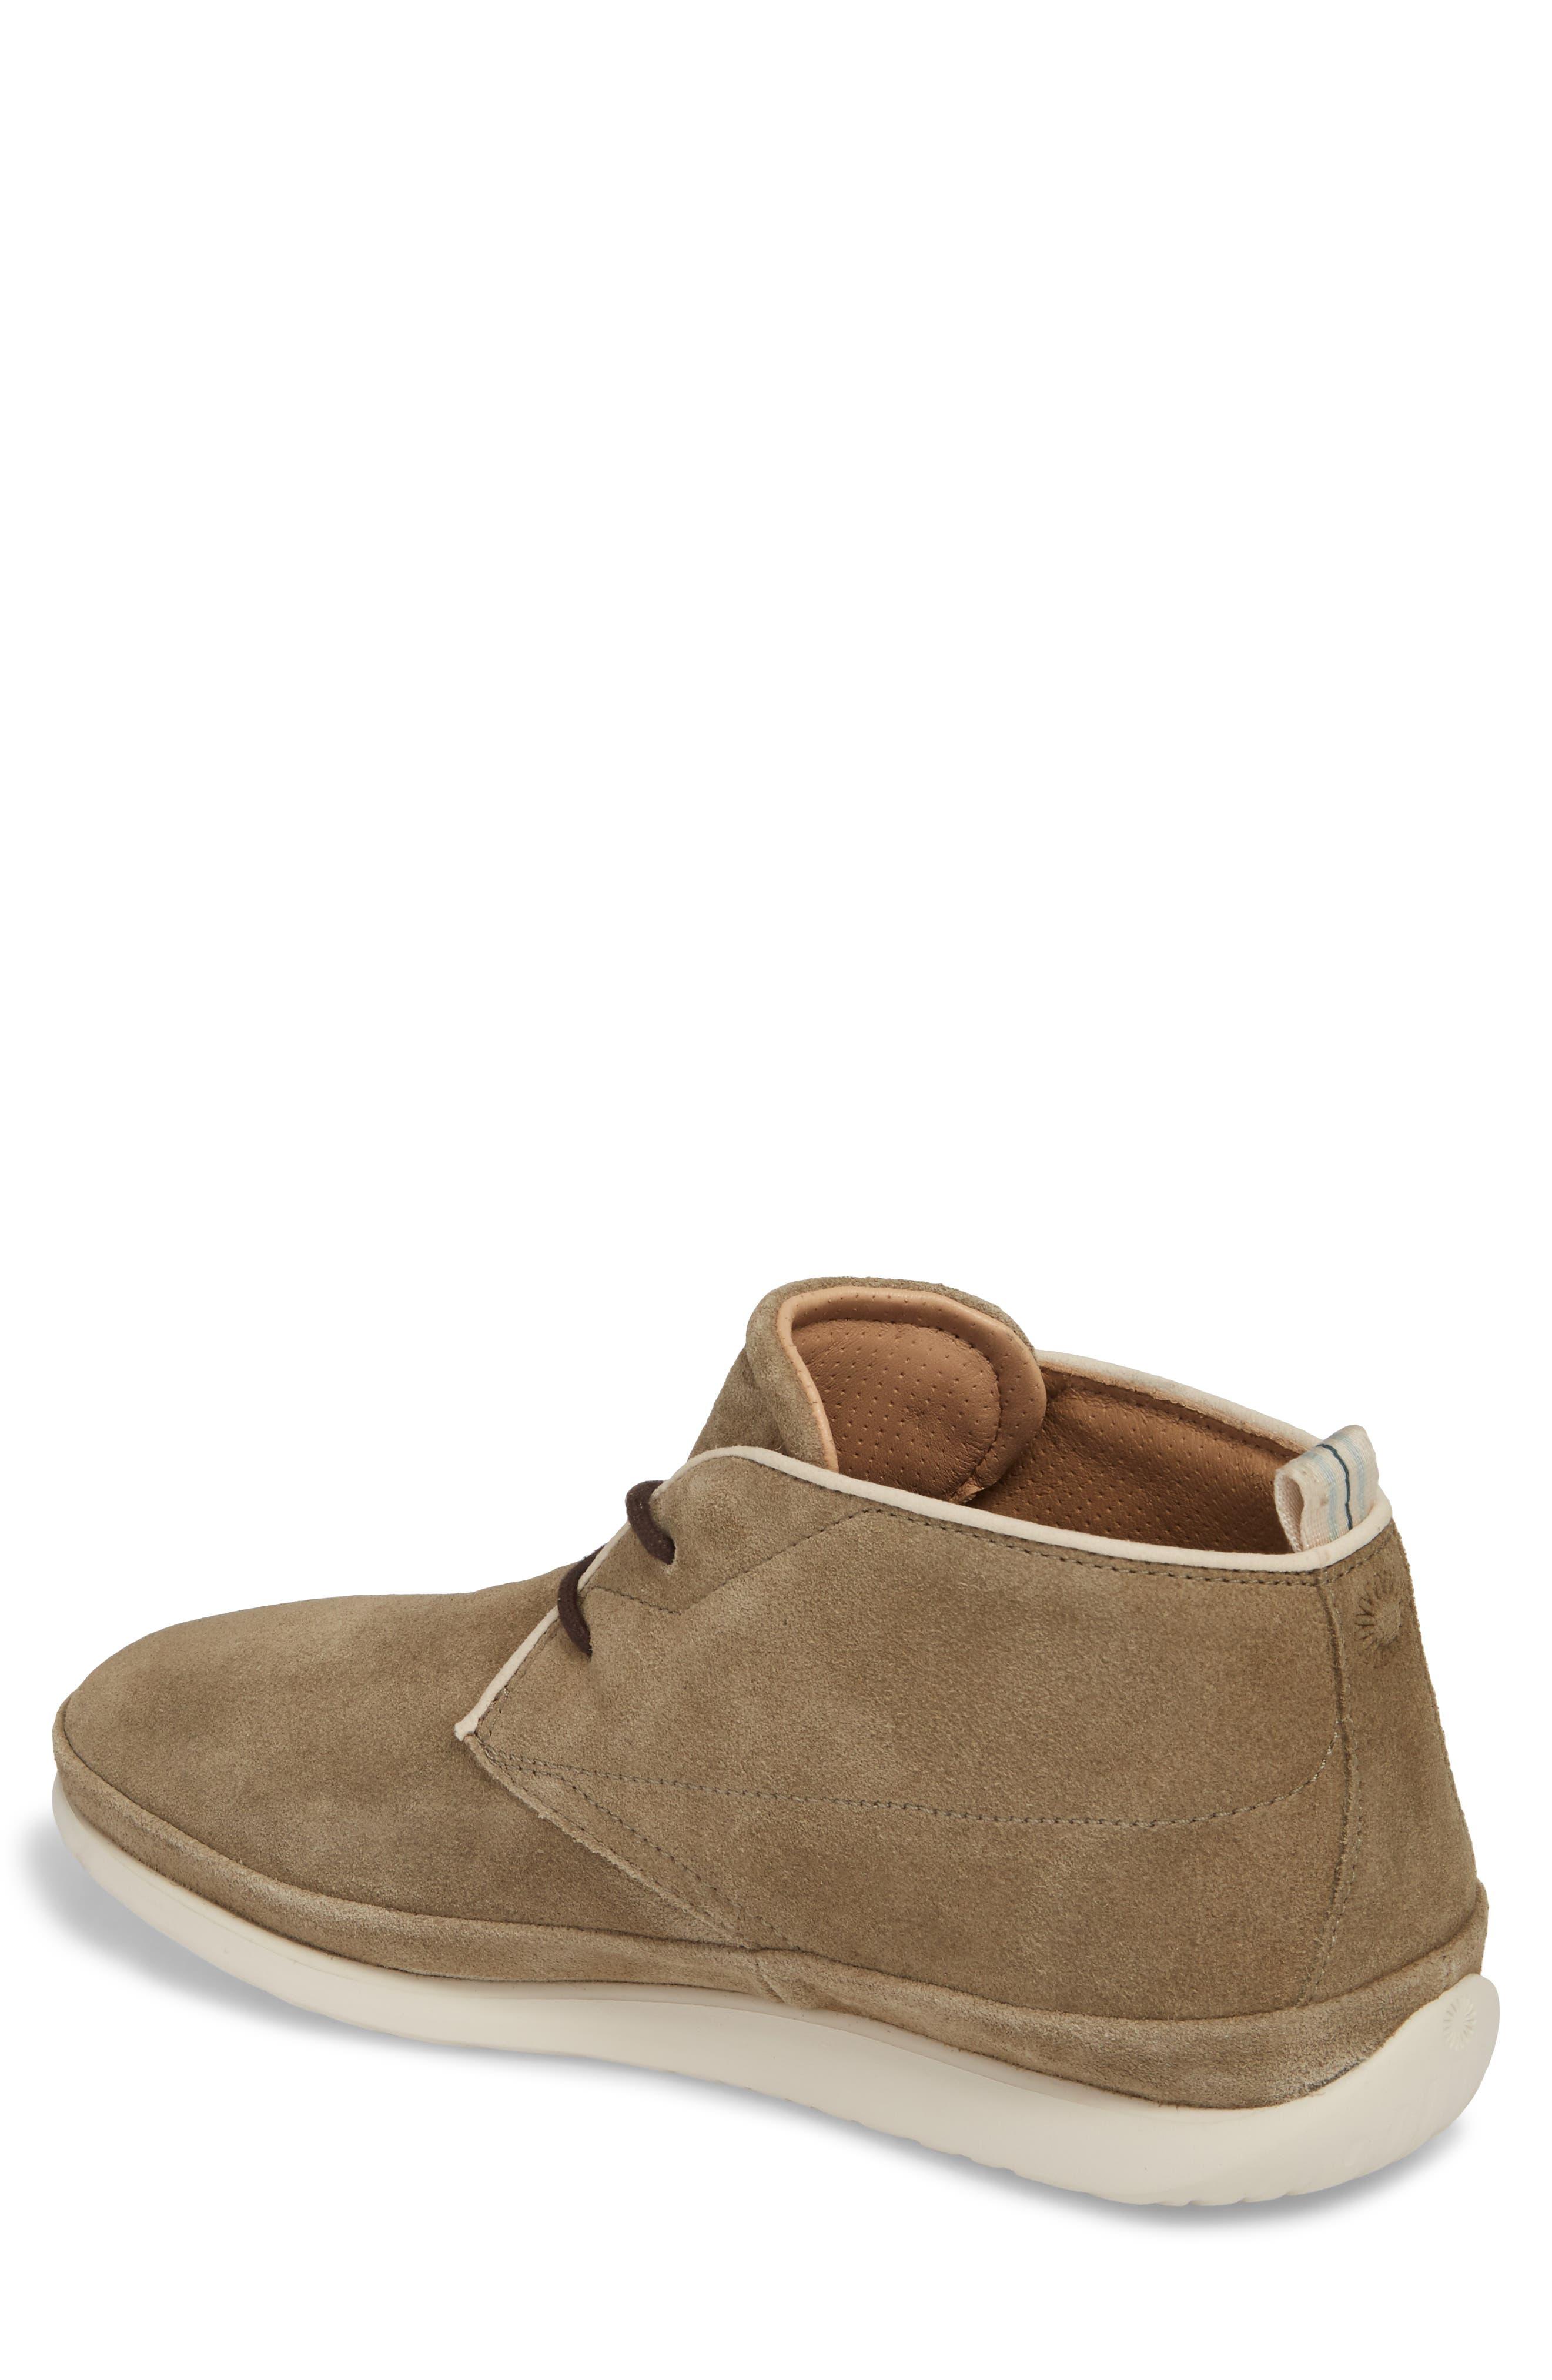 Cali Chukka Boot,                             Alternate thumbnail 2, color,                             Antilope Leather